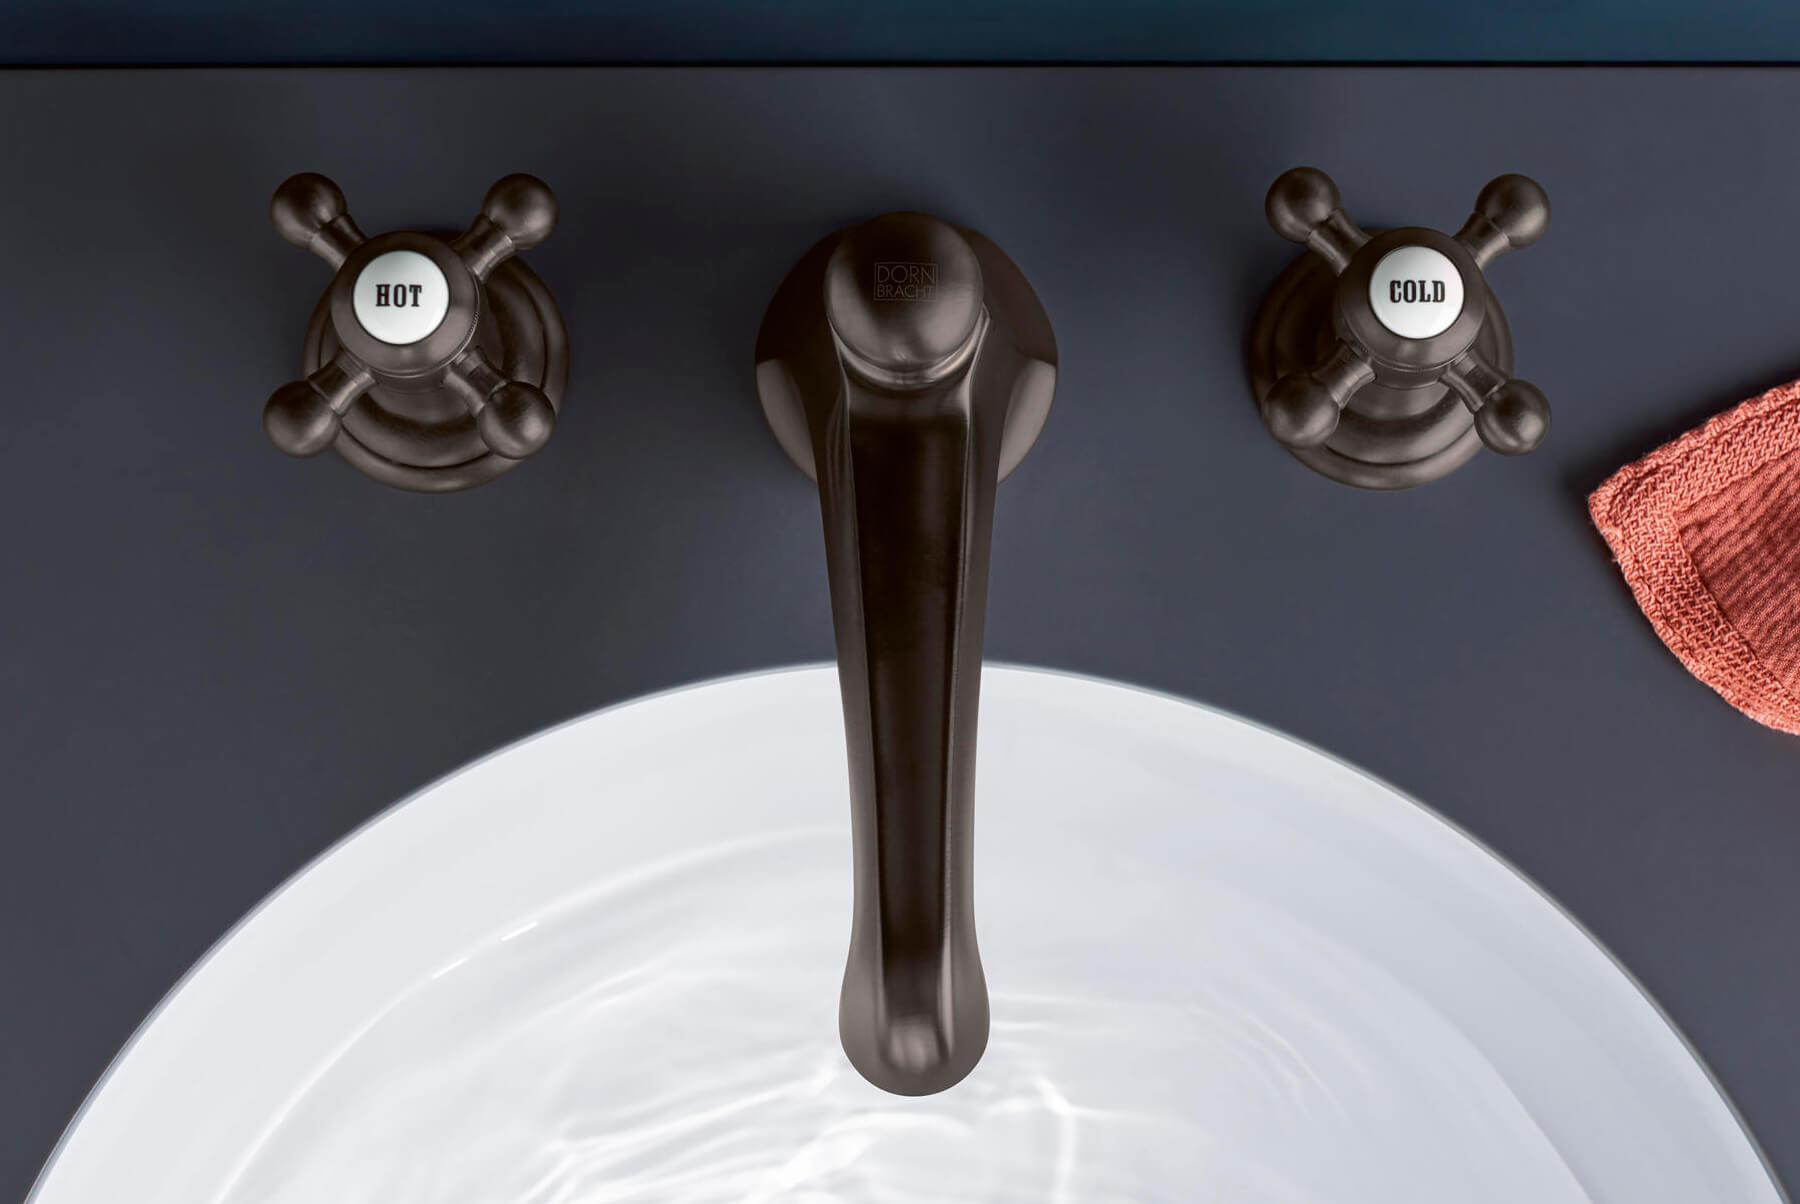 Brassware-Dornbracht-madison-inset-5-1800x1204